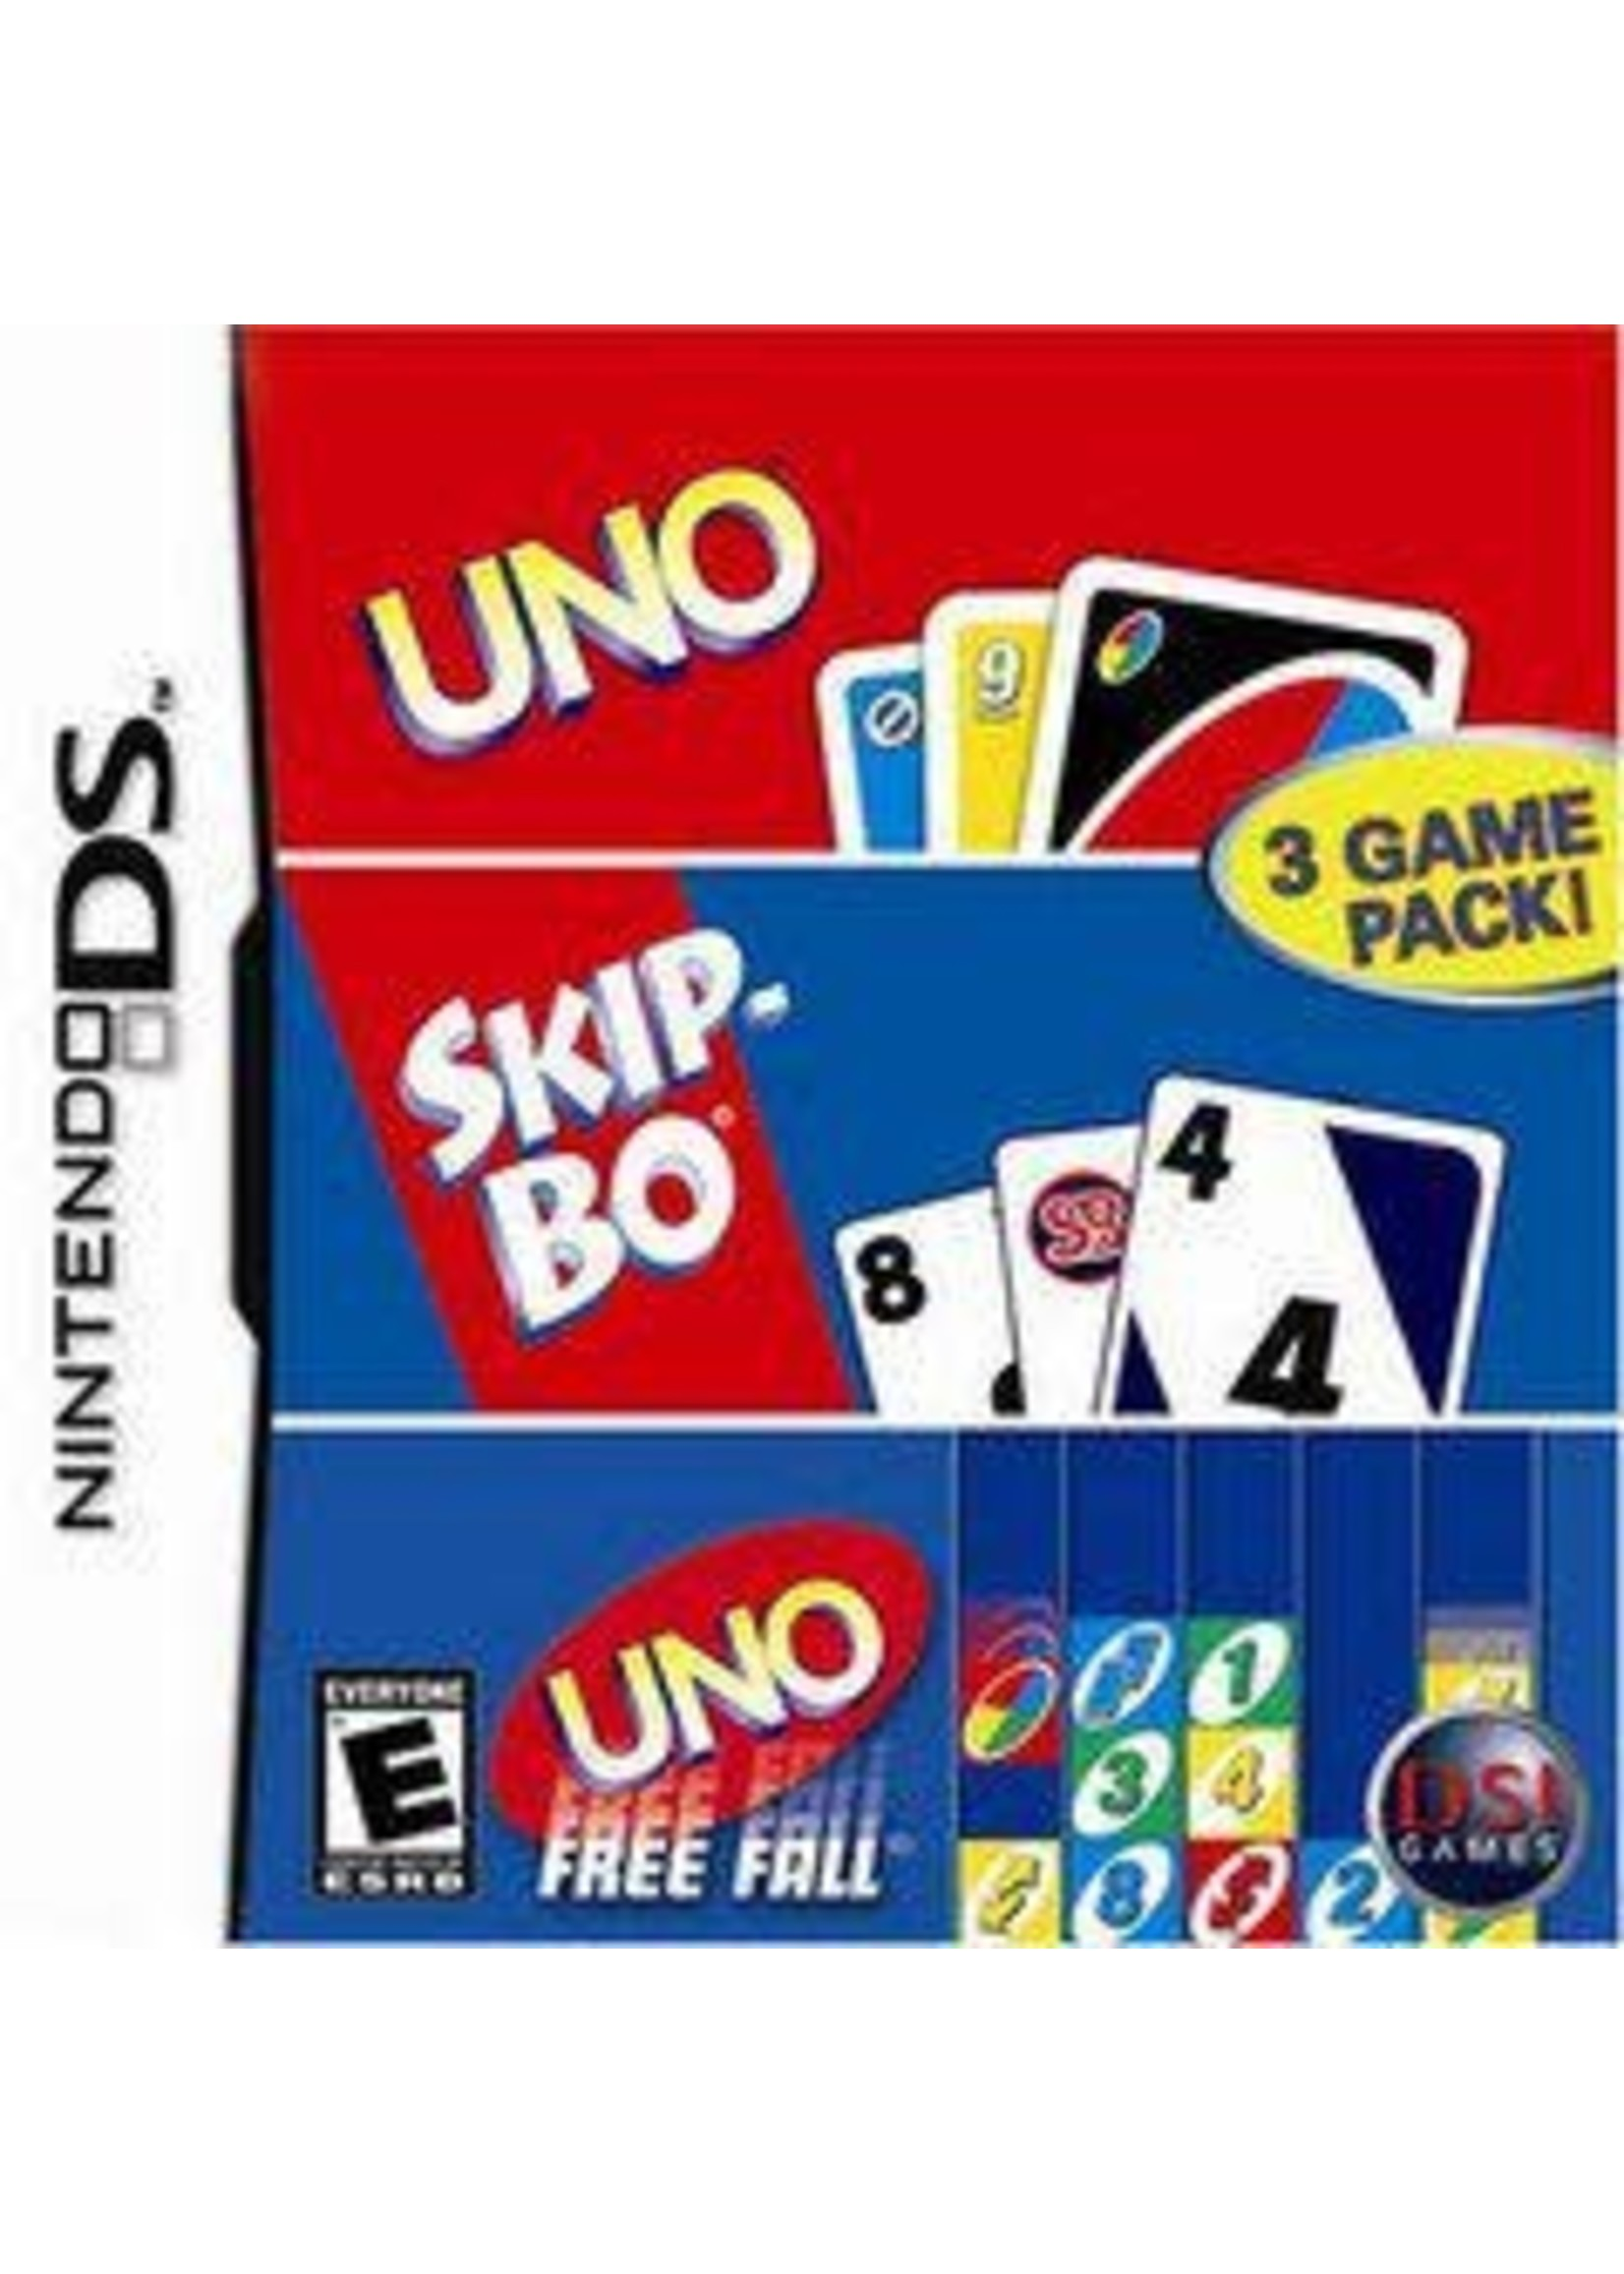 Uno & SkipBo & Free Fall Nintendo DS